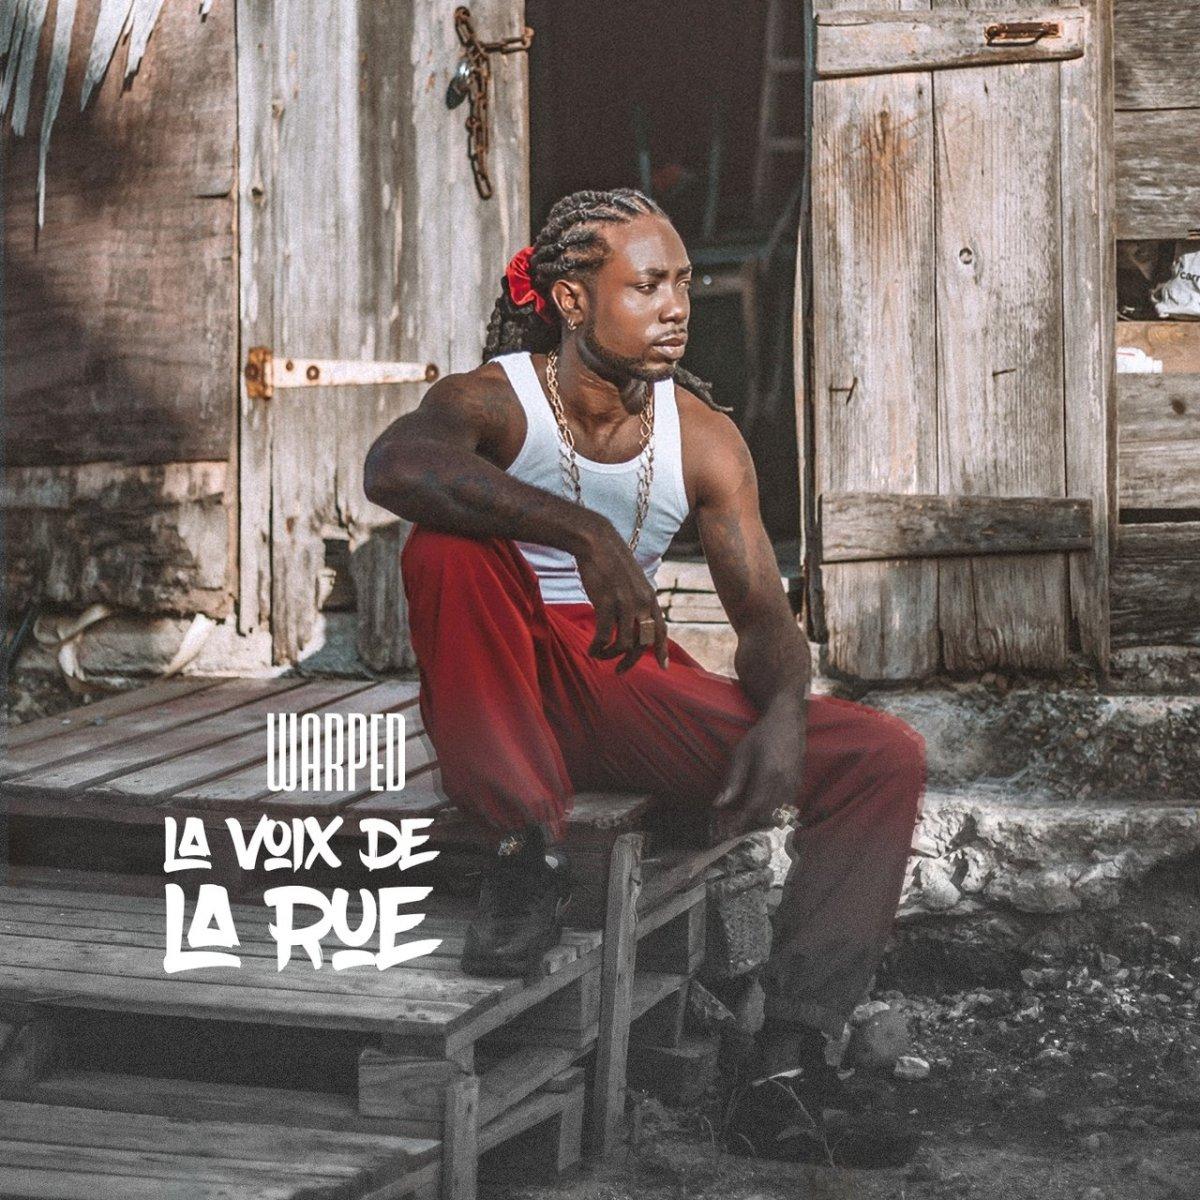 Warped - La Voix De La Rue (Cover)